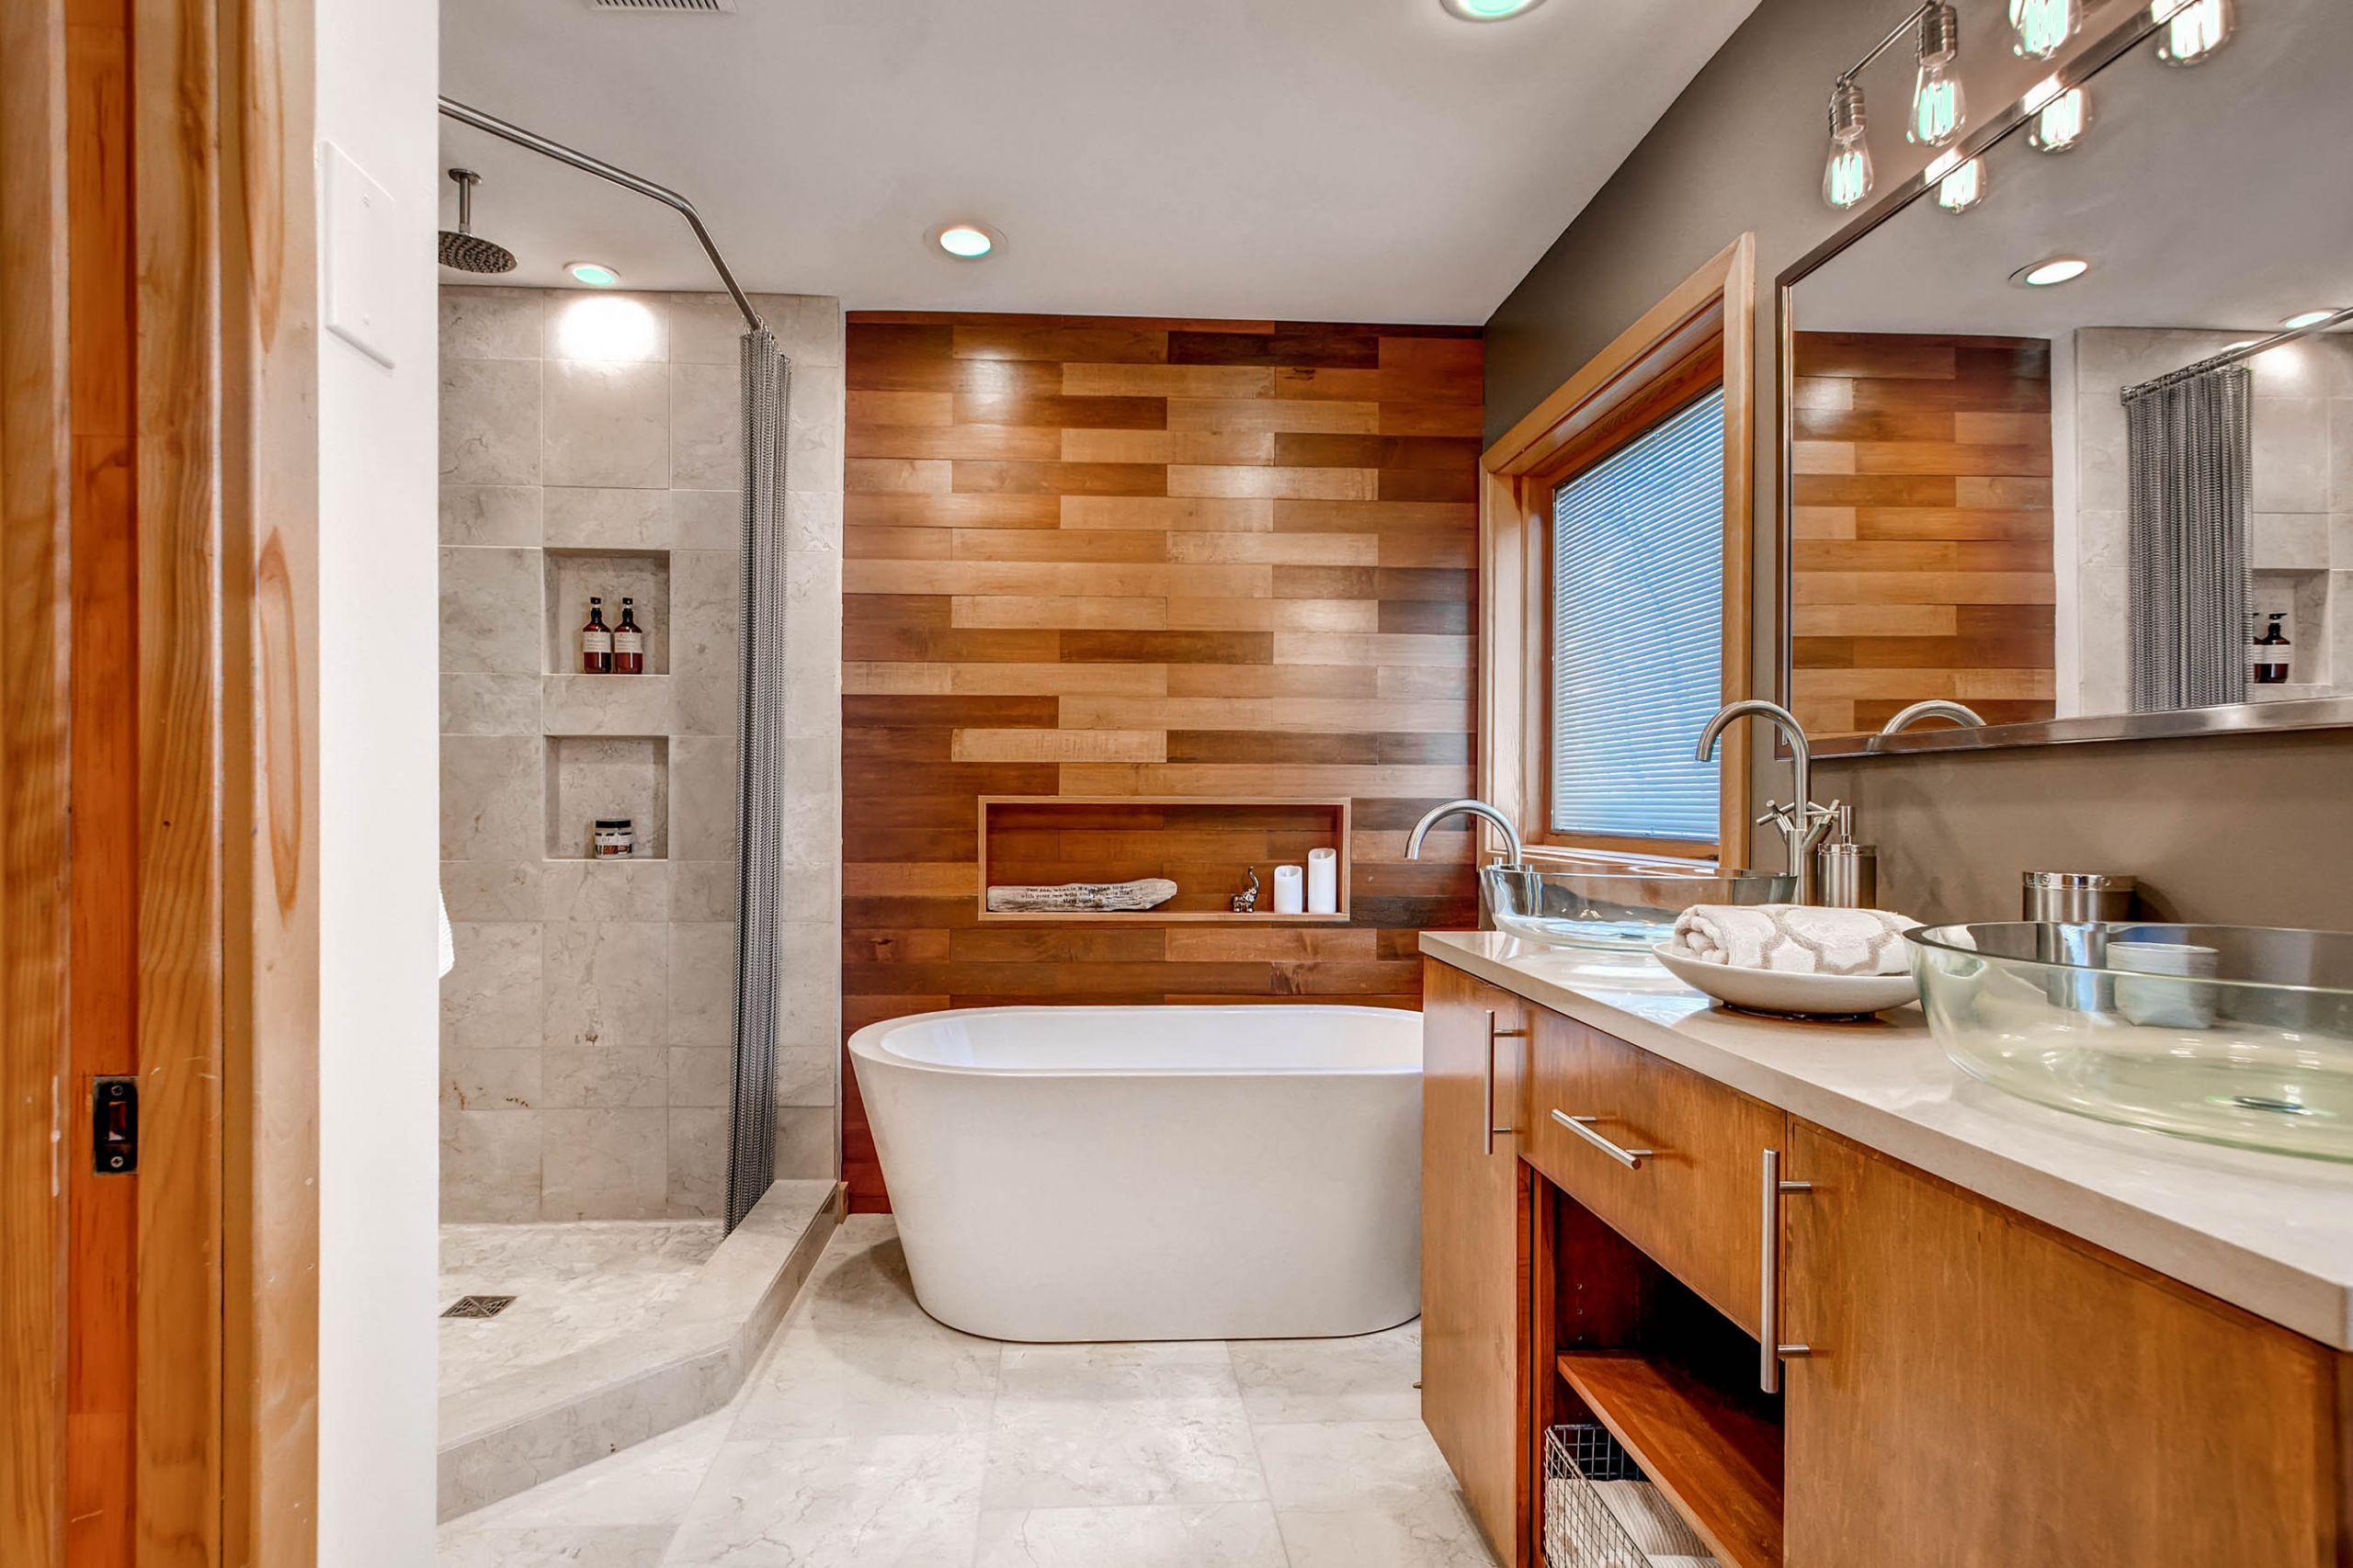 Spa Master Bathroom  Spa Like Master Bathroom Remodel